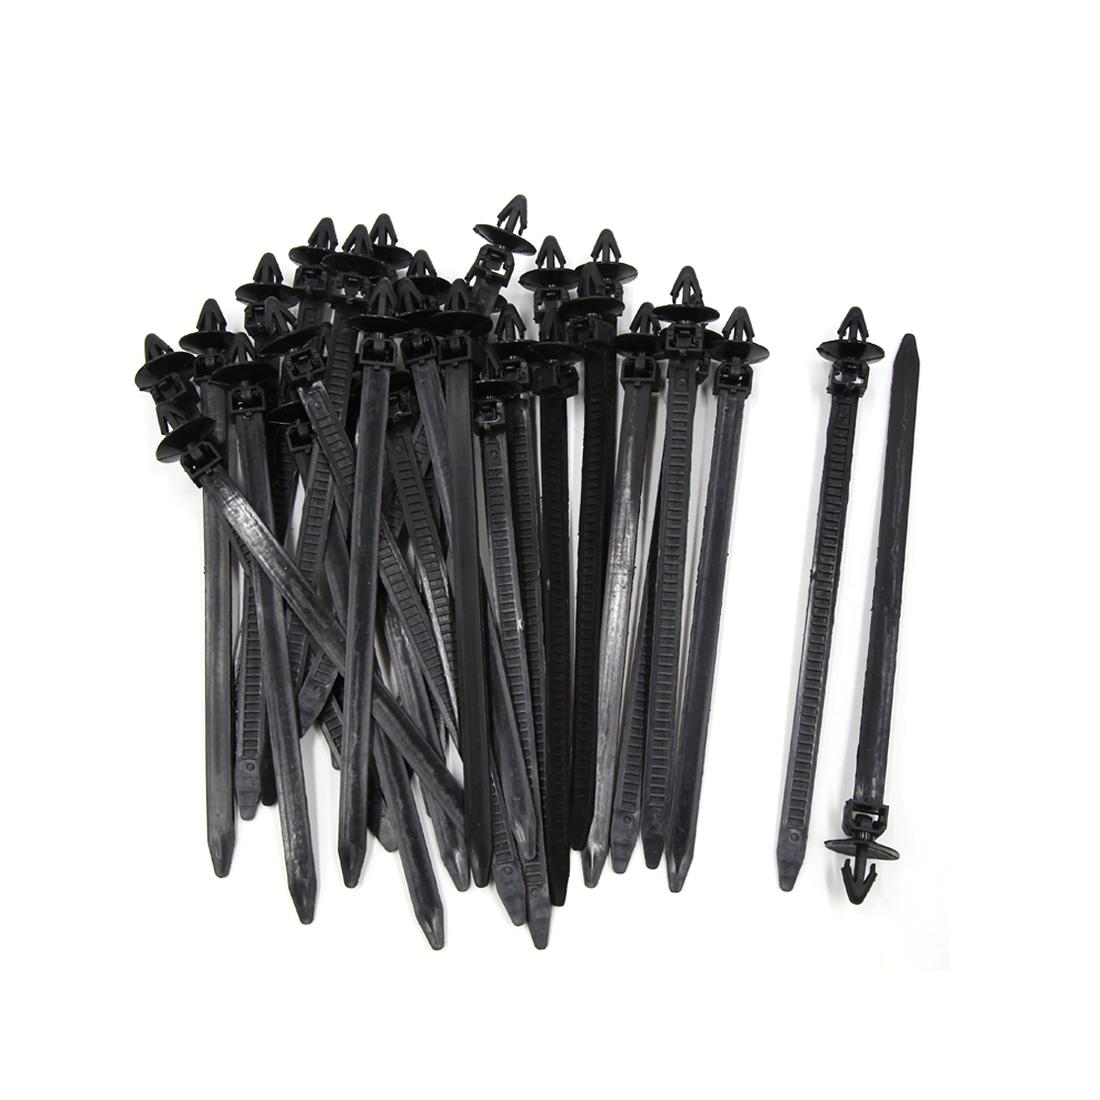 30Pcs 8mm x 175mm Plastic Push Mount Loop Cable Ties Zip Wire Fastener Black